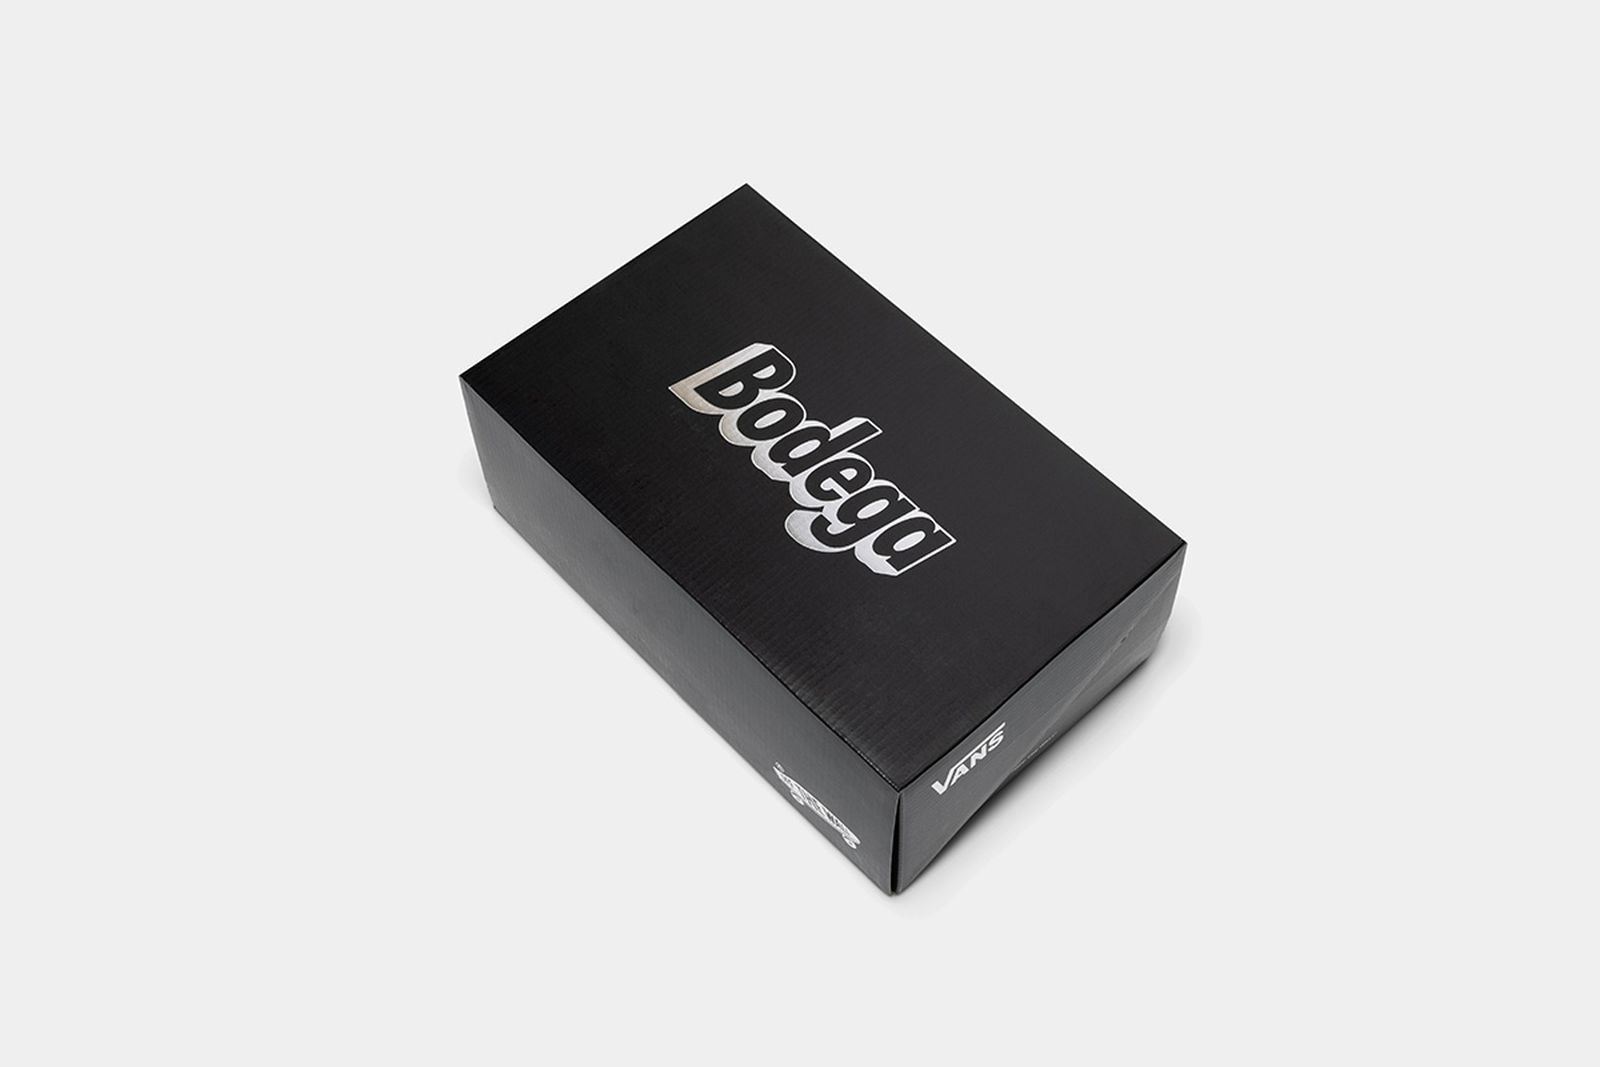 bodega-vault-by-vans-og-style-36-lx-release-date-price-13